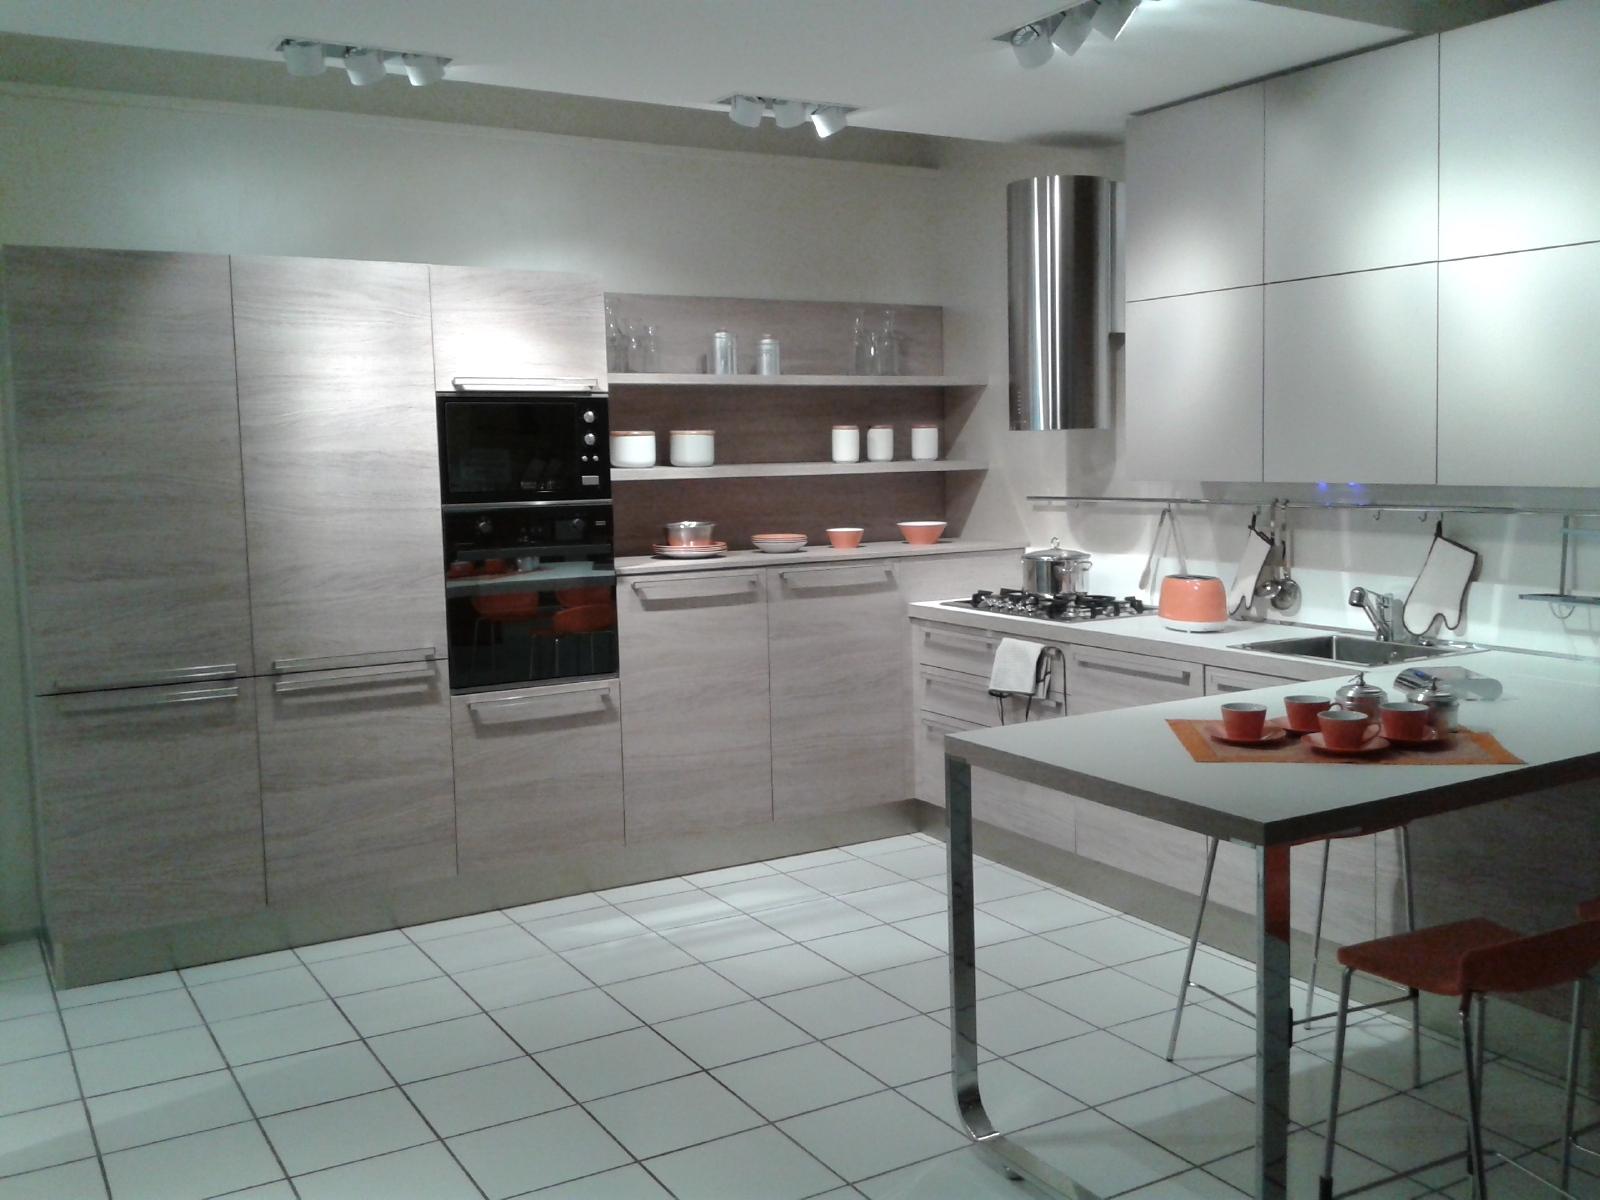 Veneta Cucine è Una Buona Marca | madgeweb.com idee di interior design